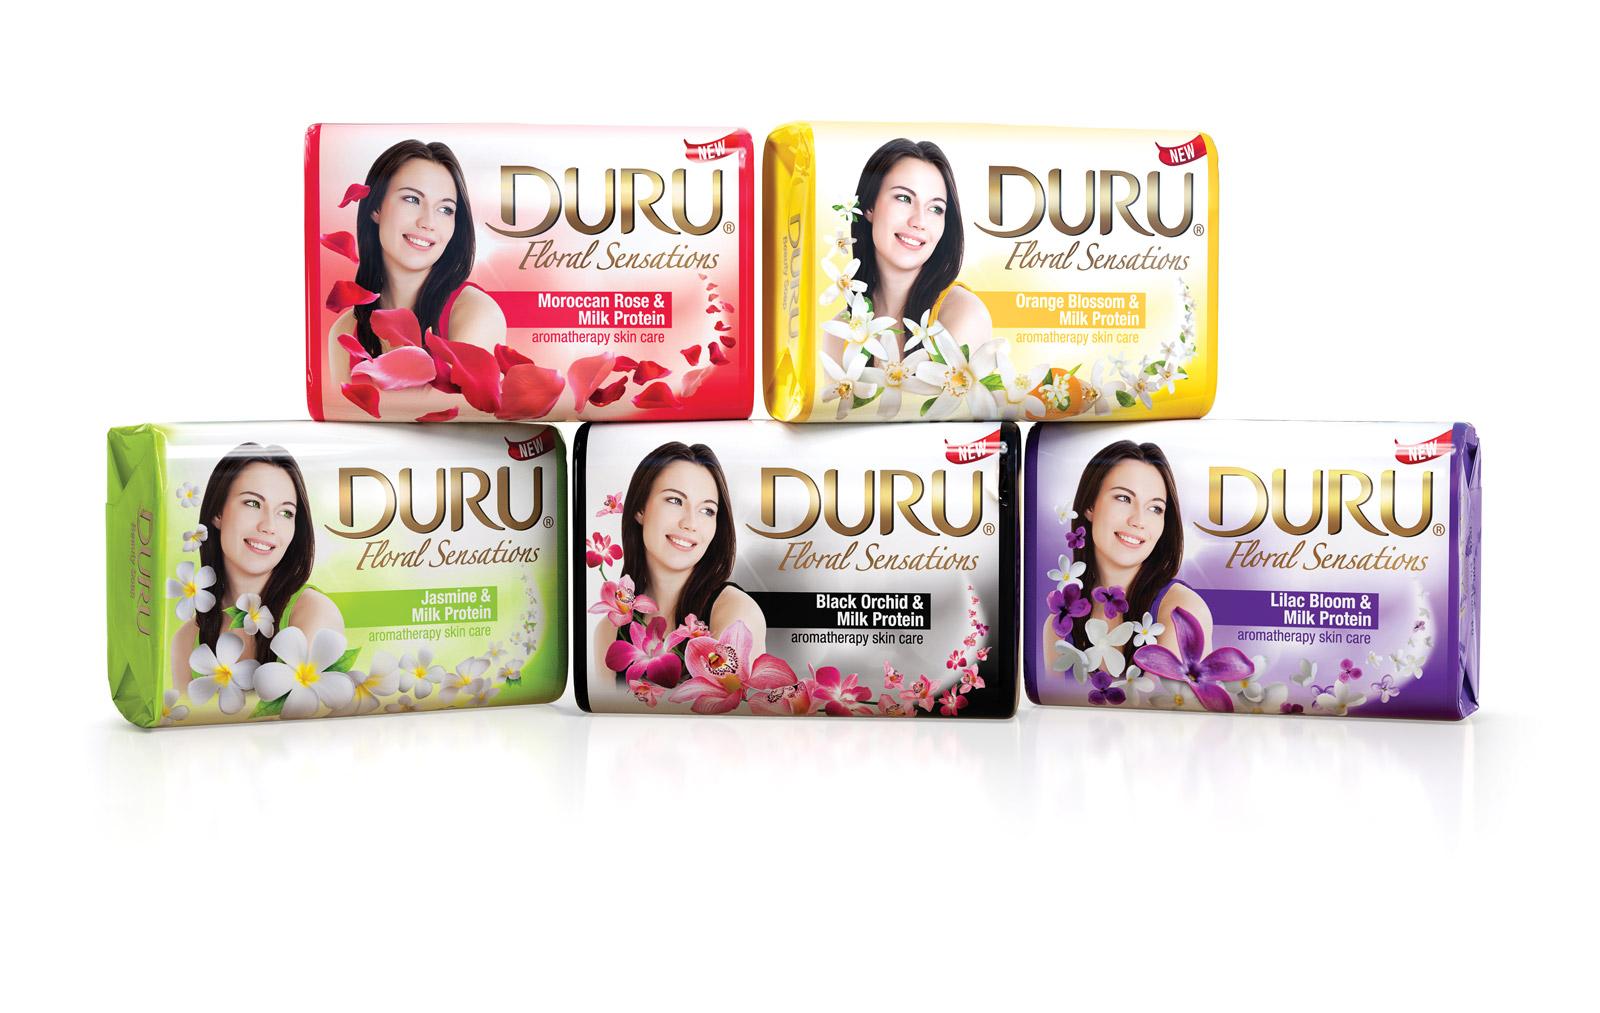 DURU_FloralSensation_01